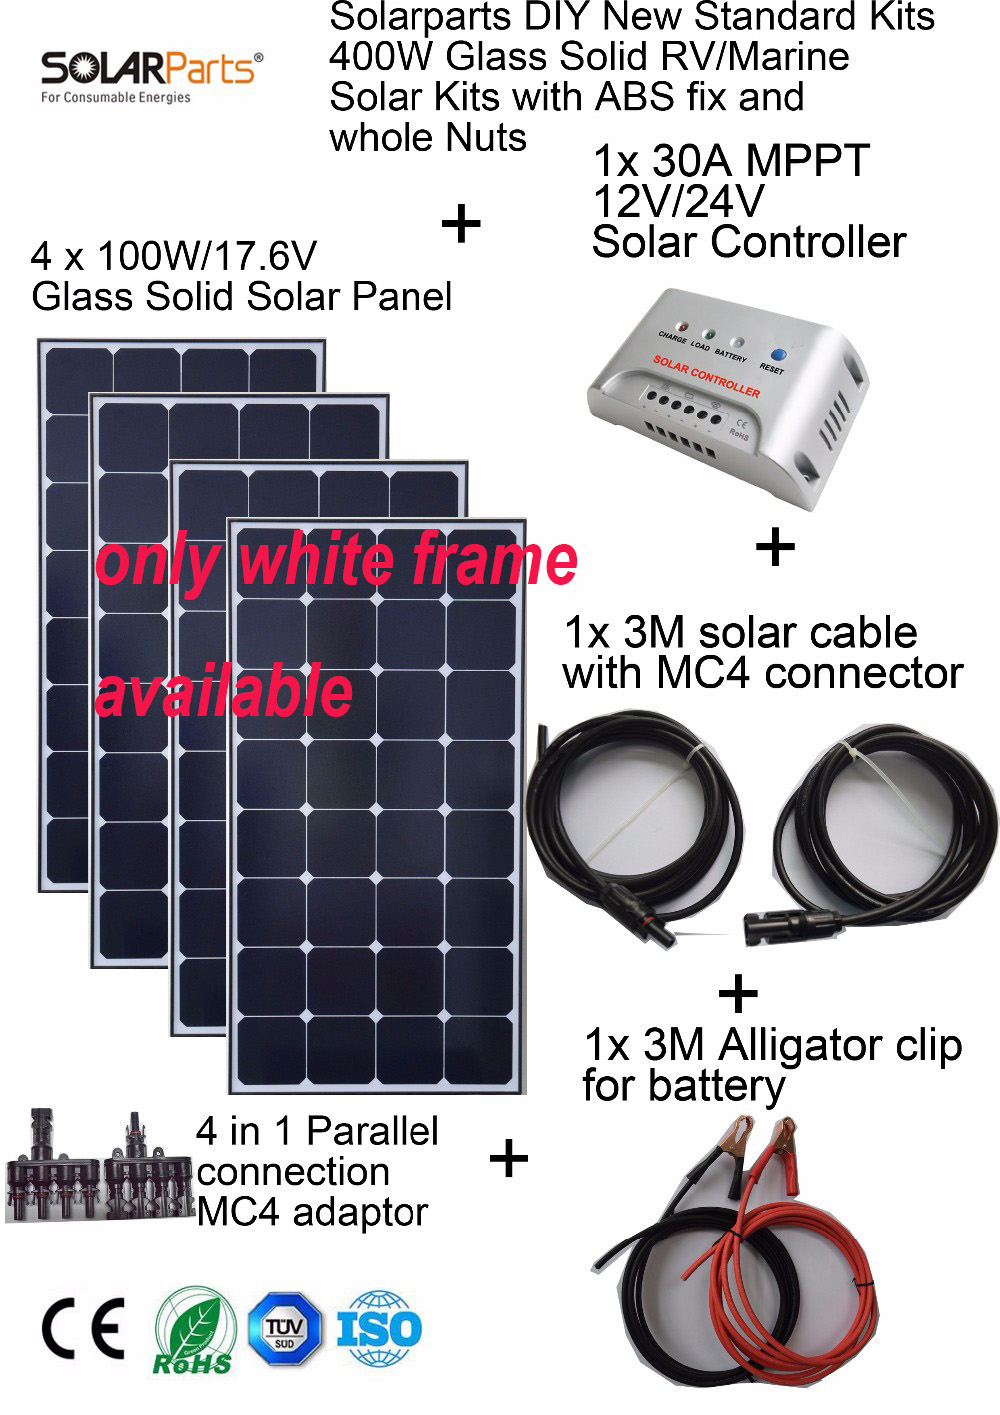 Solarparts 4x100W Monocrystalline Solar Module Sunpower LED light outdoor solar panel cell system DIY kits RV marine home camp .